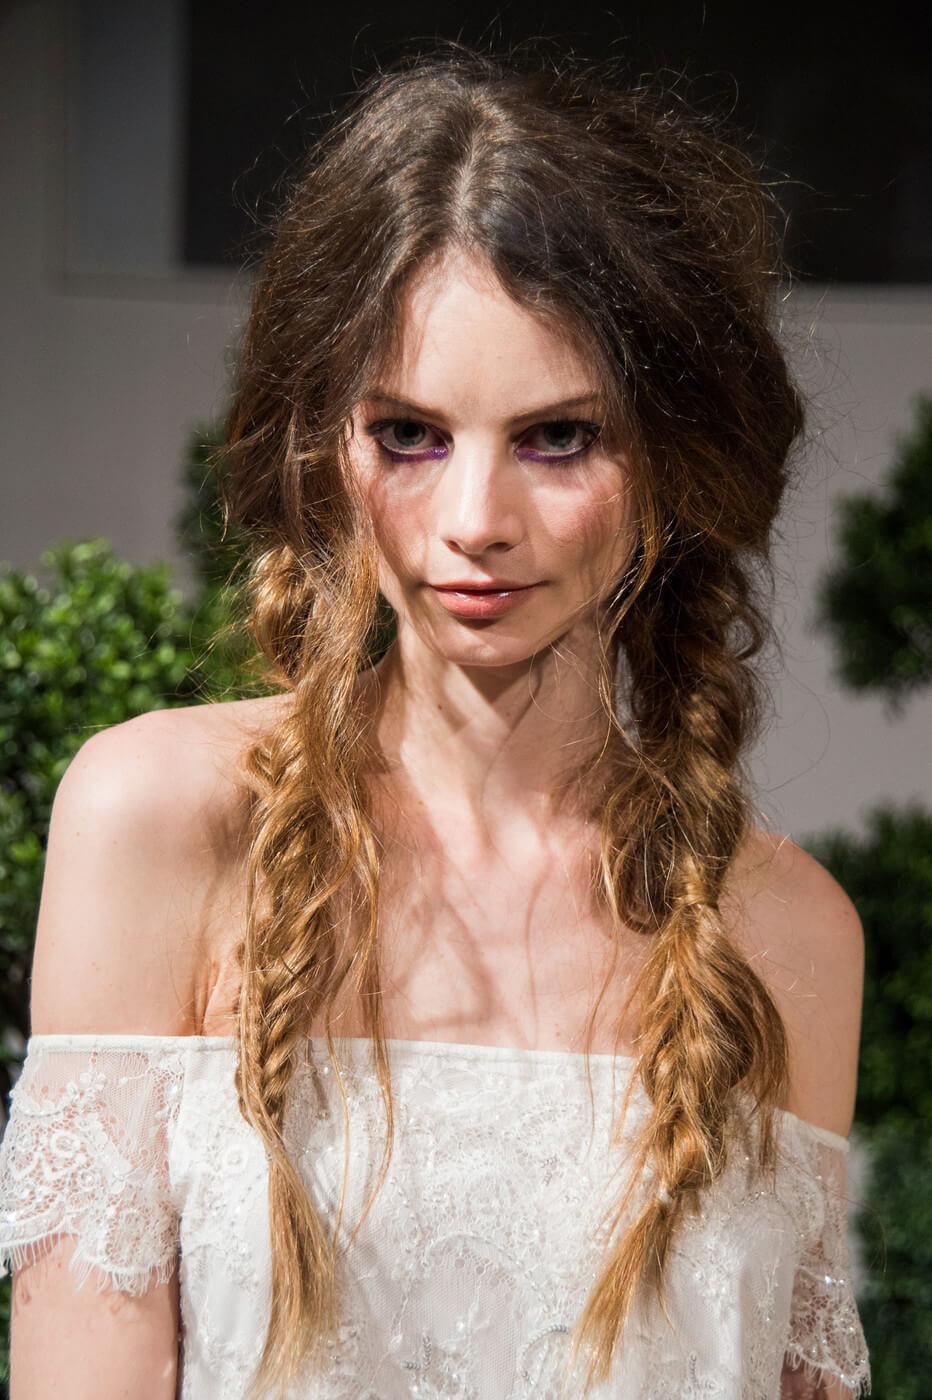 Alice + Olivia Hair